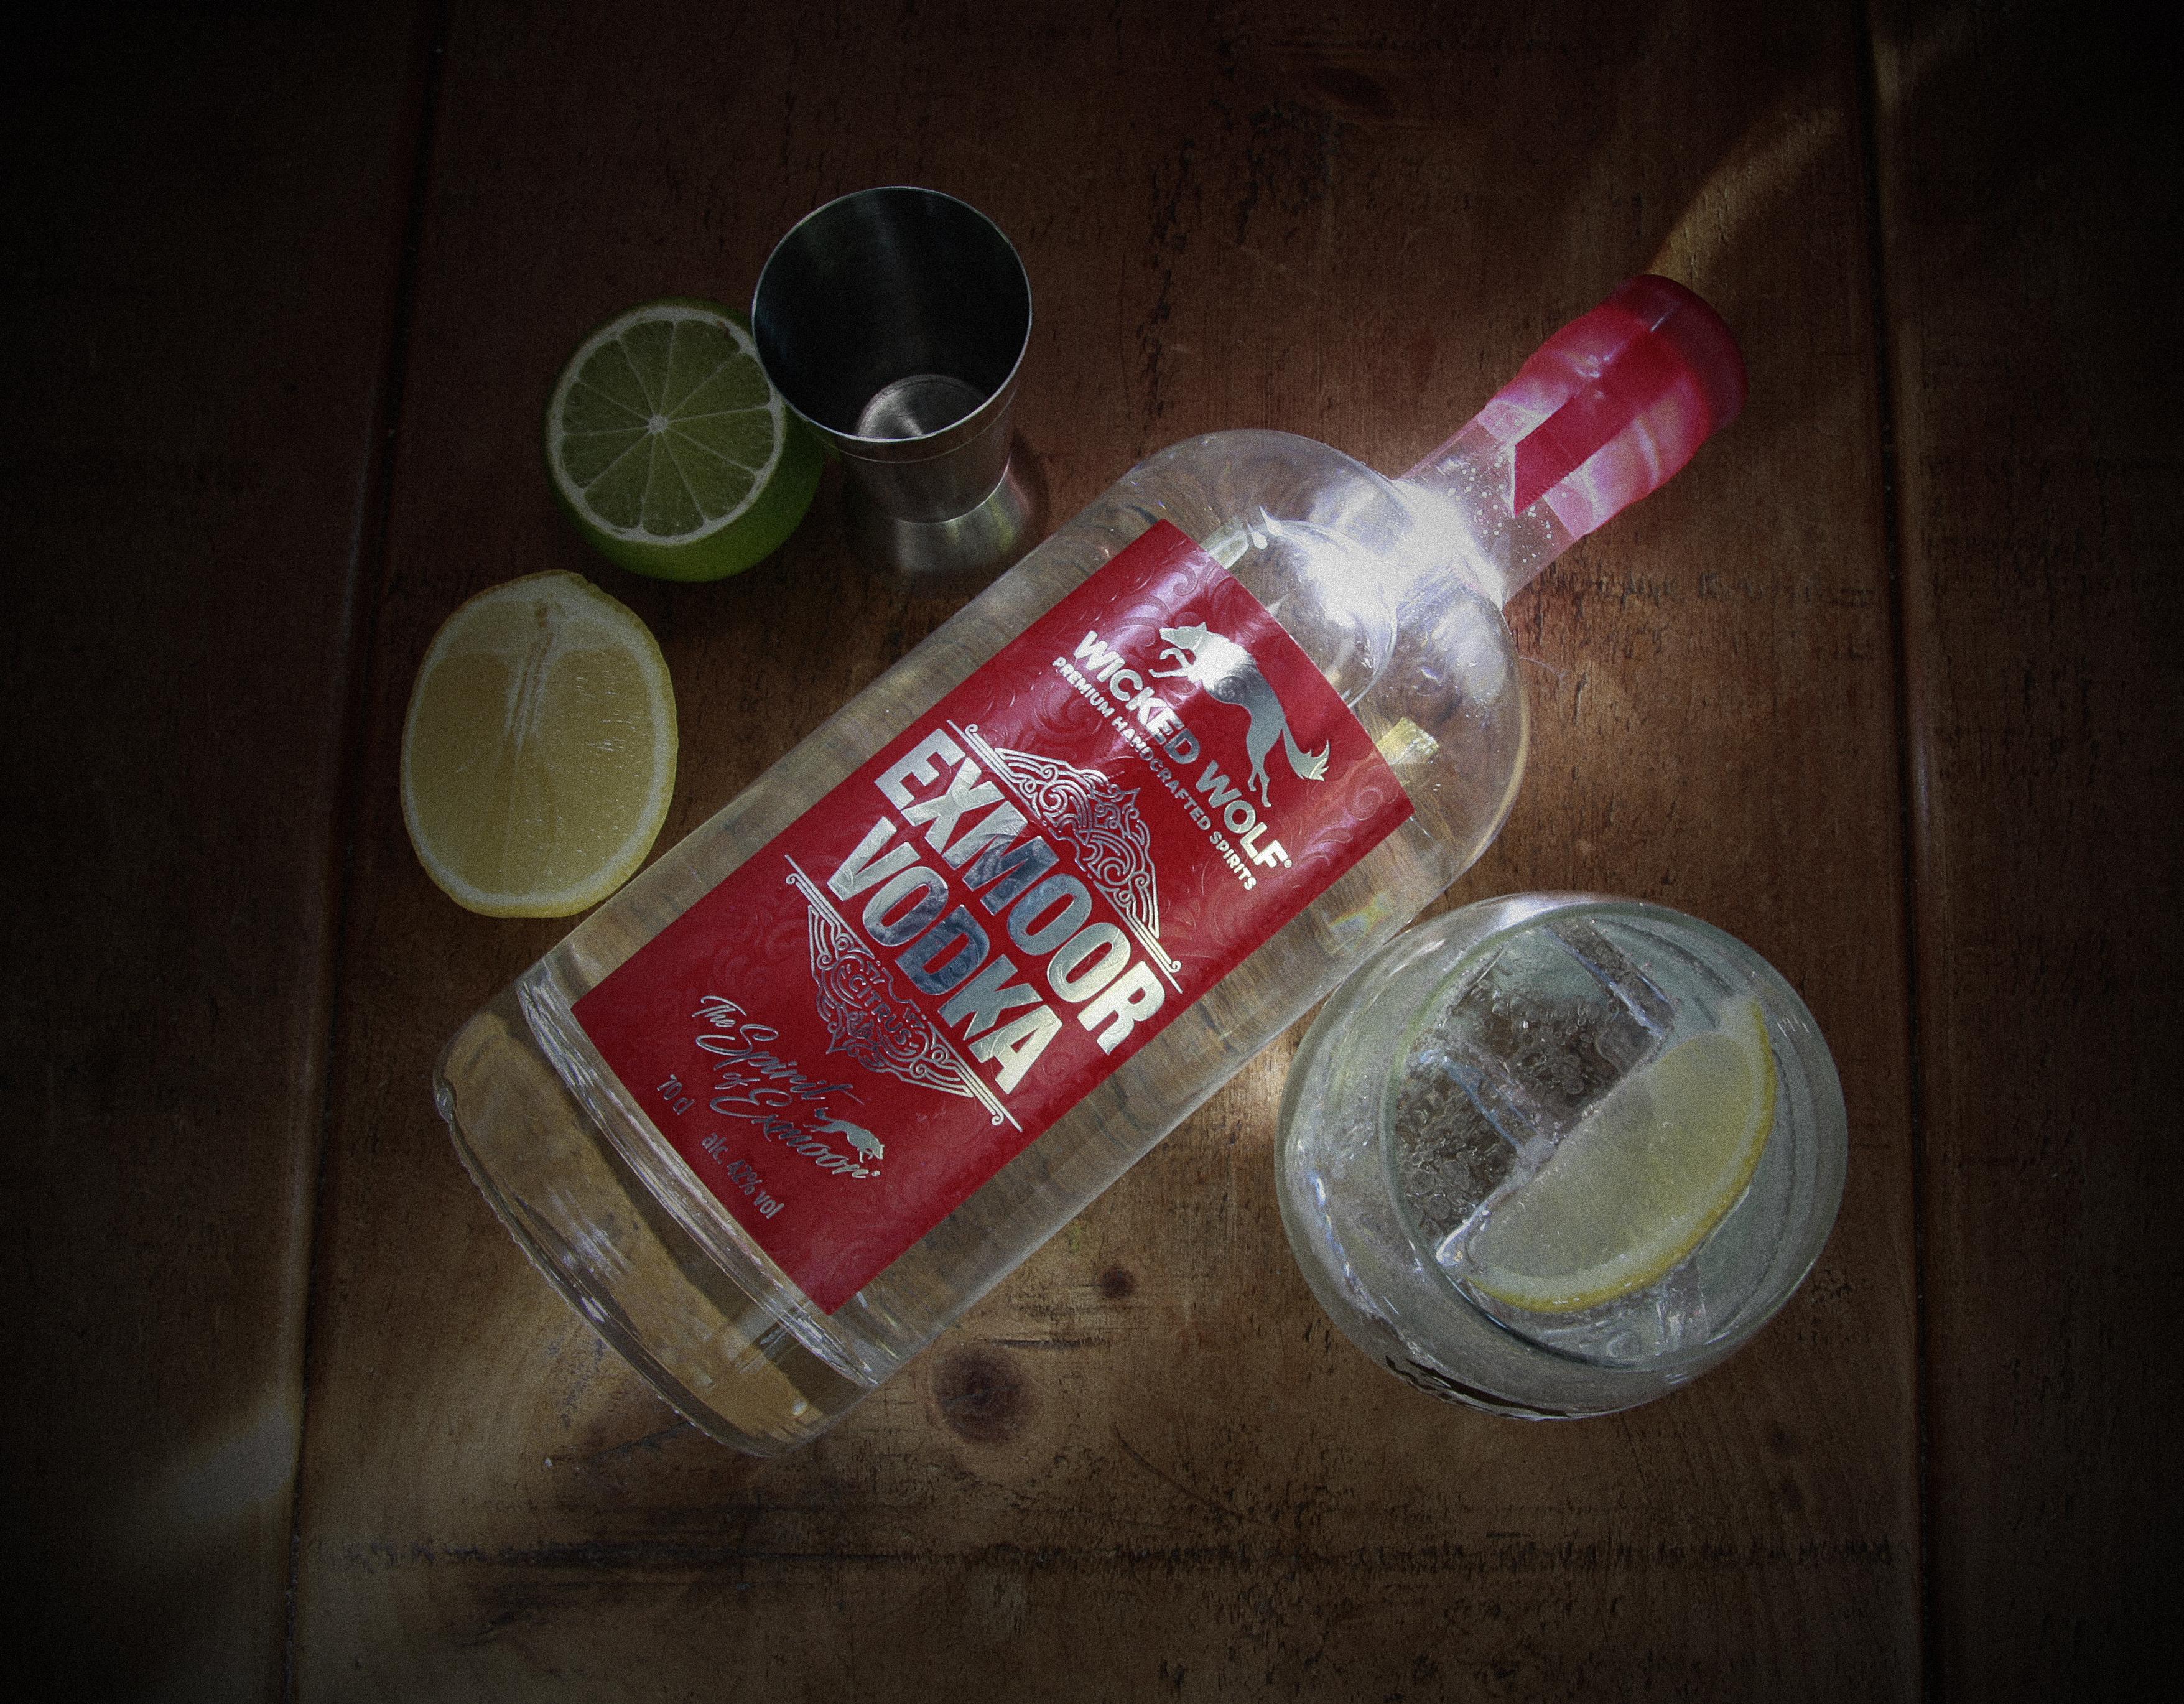 Exmoor Vodka Life